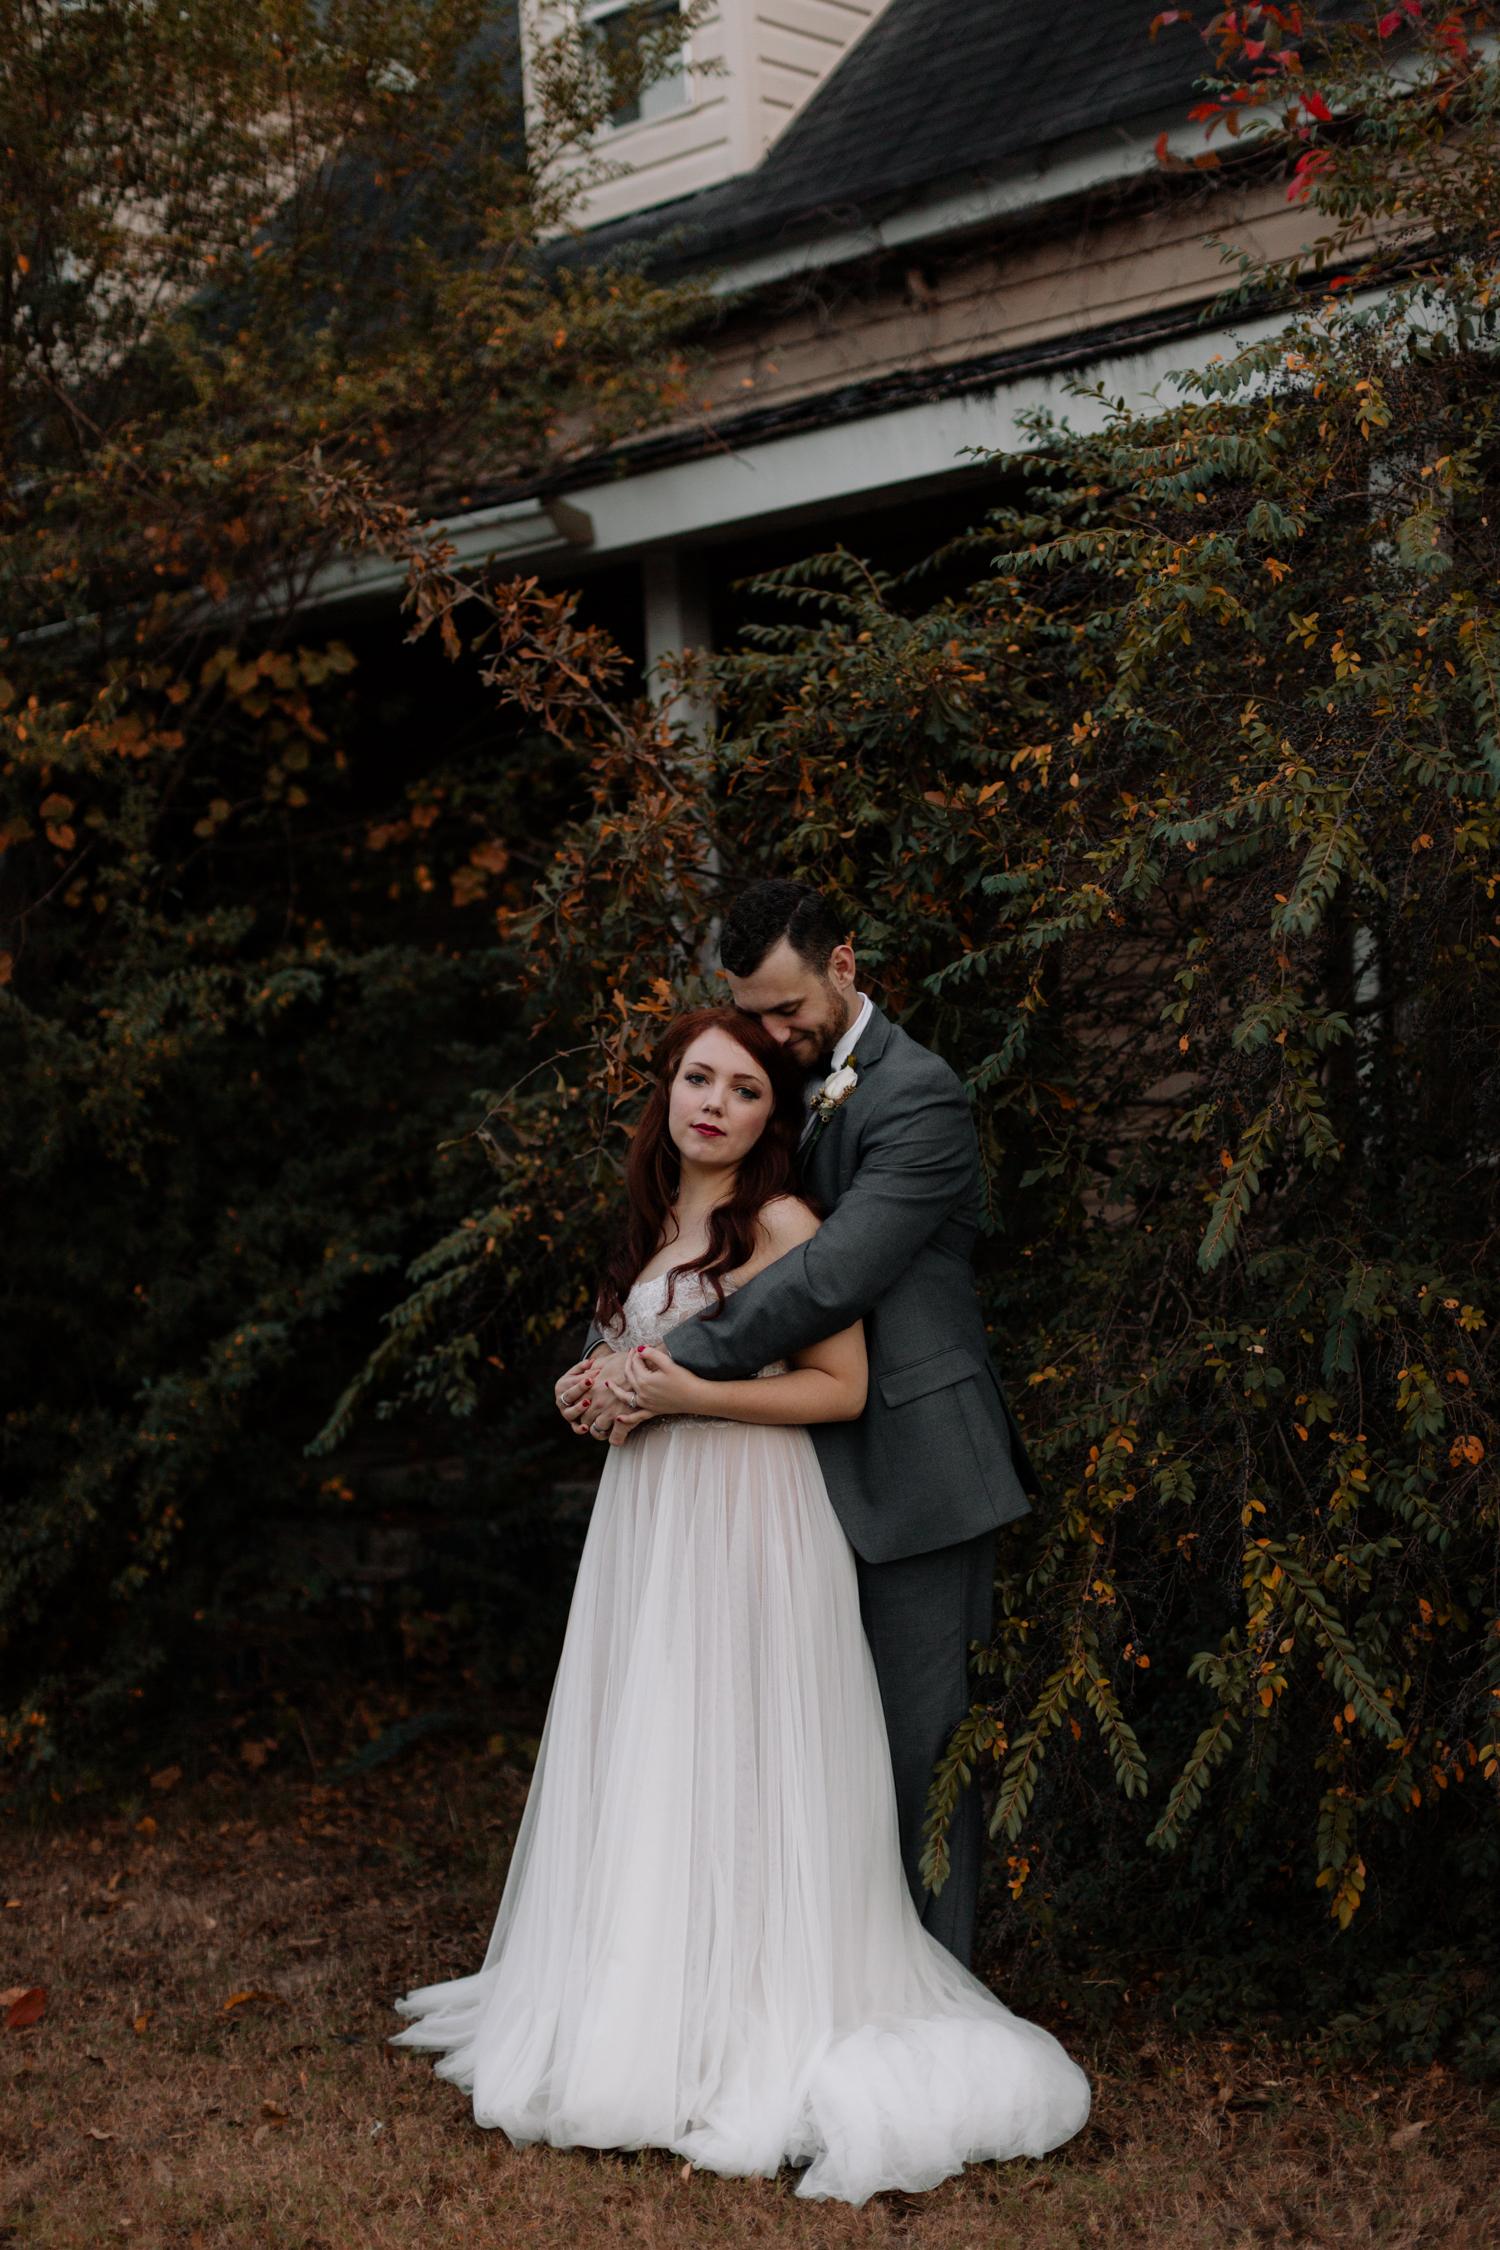 Yellow+Bird+Visuals+Destination+Wedding+Photographer-7617